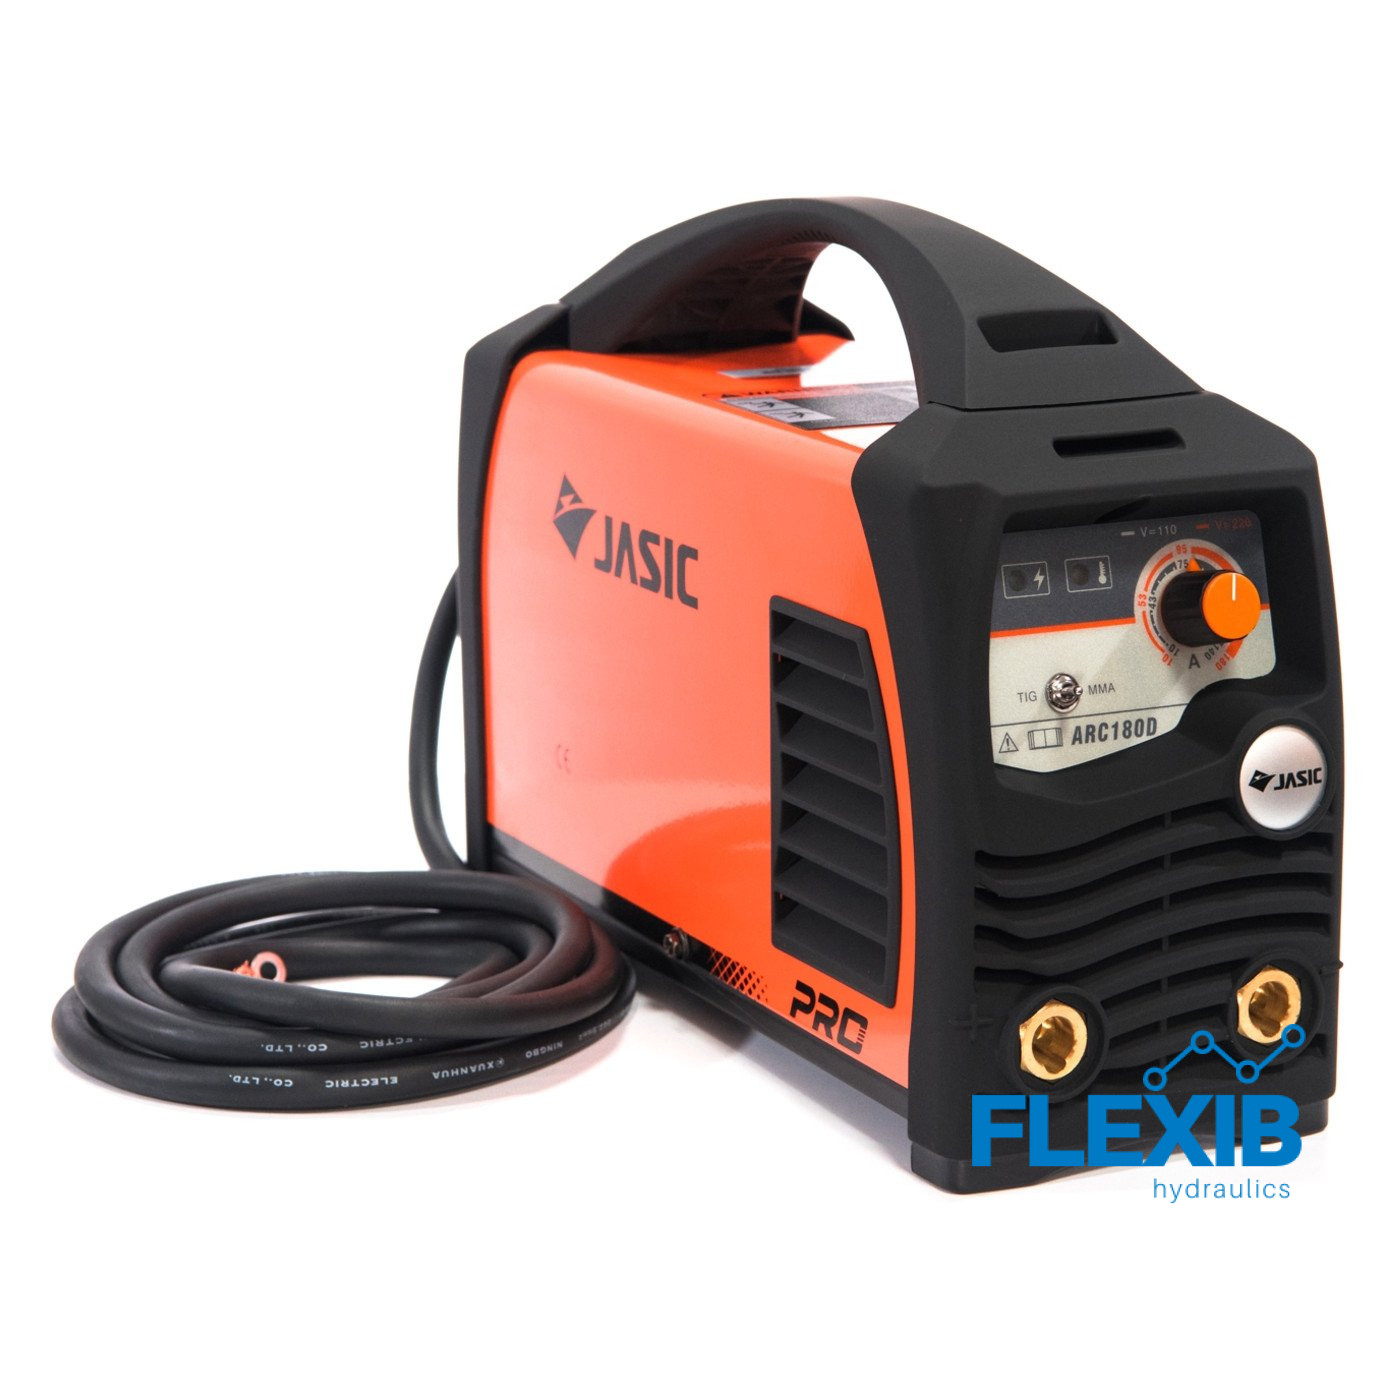 Inverterkeevitus MMA/TIG Jasic Arc 180A Pro Elektrood keevitusseadmed Elektrood keevitusseadmed